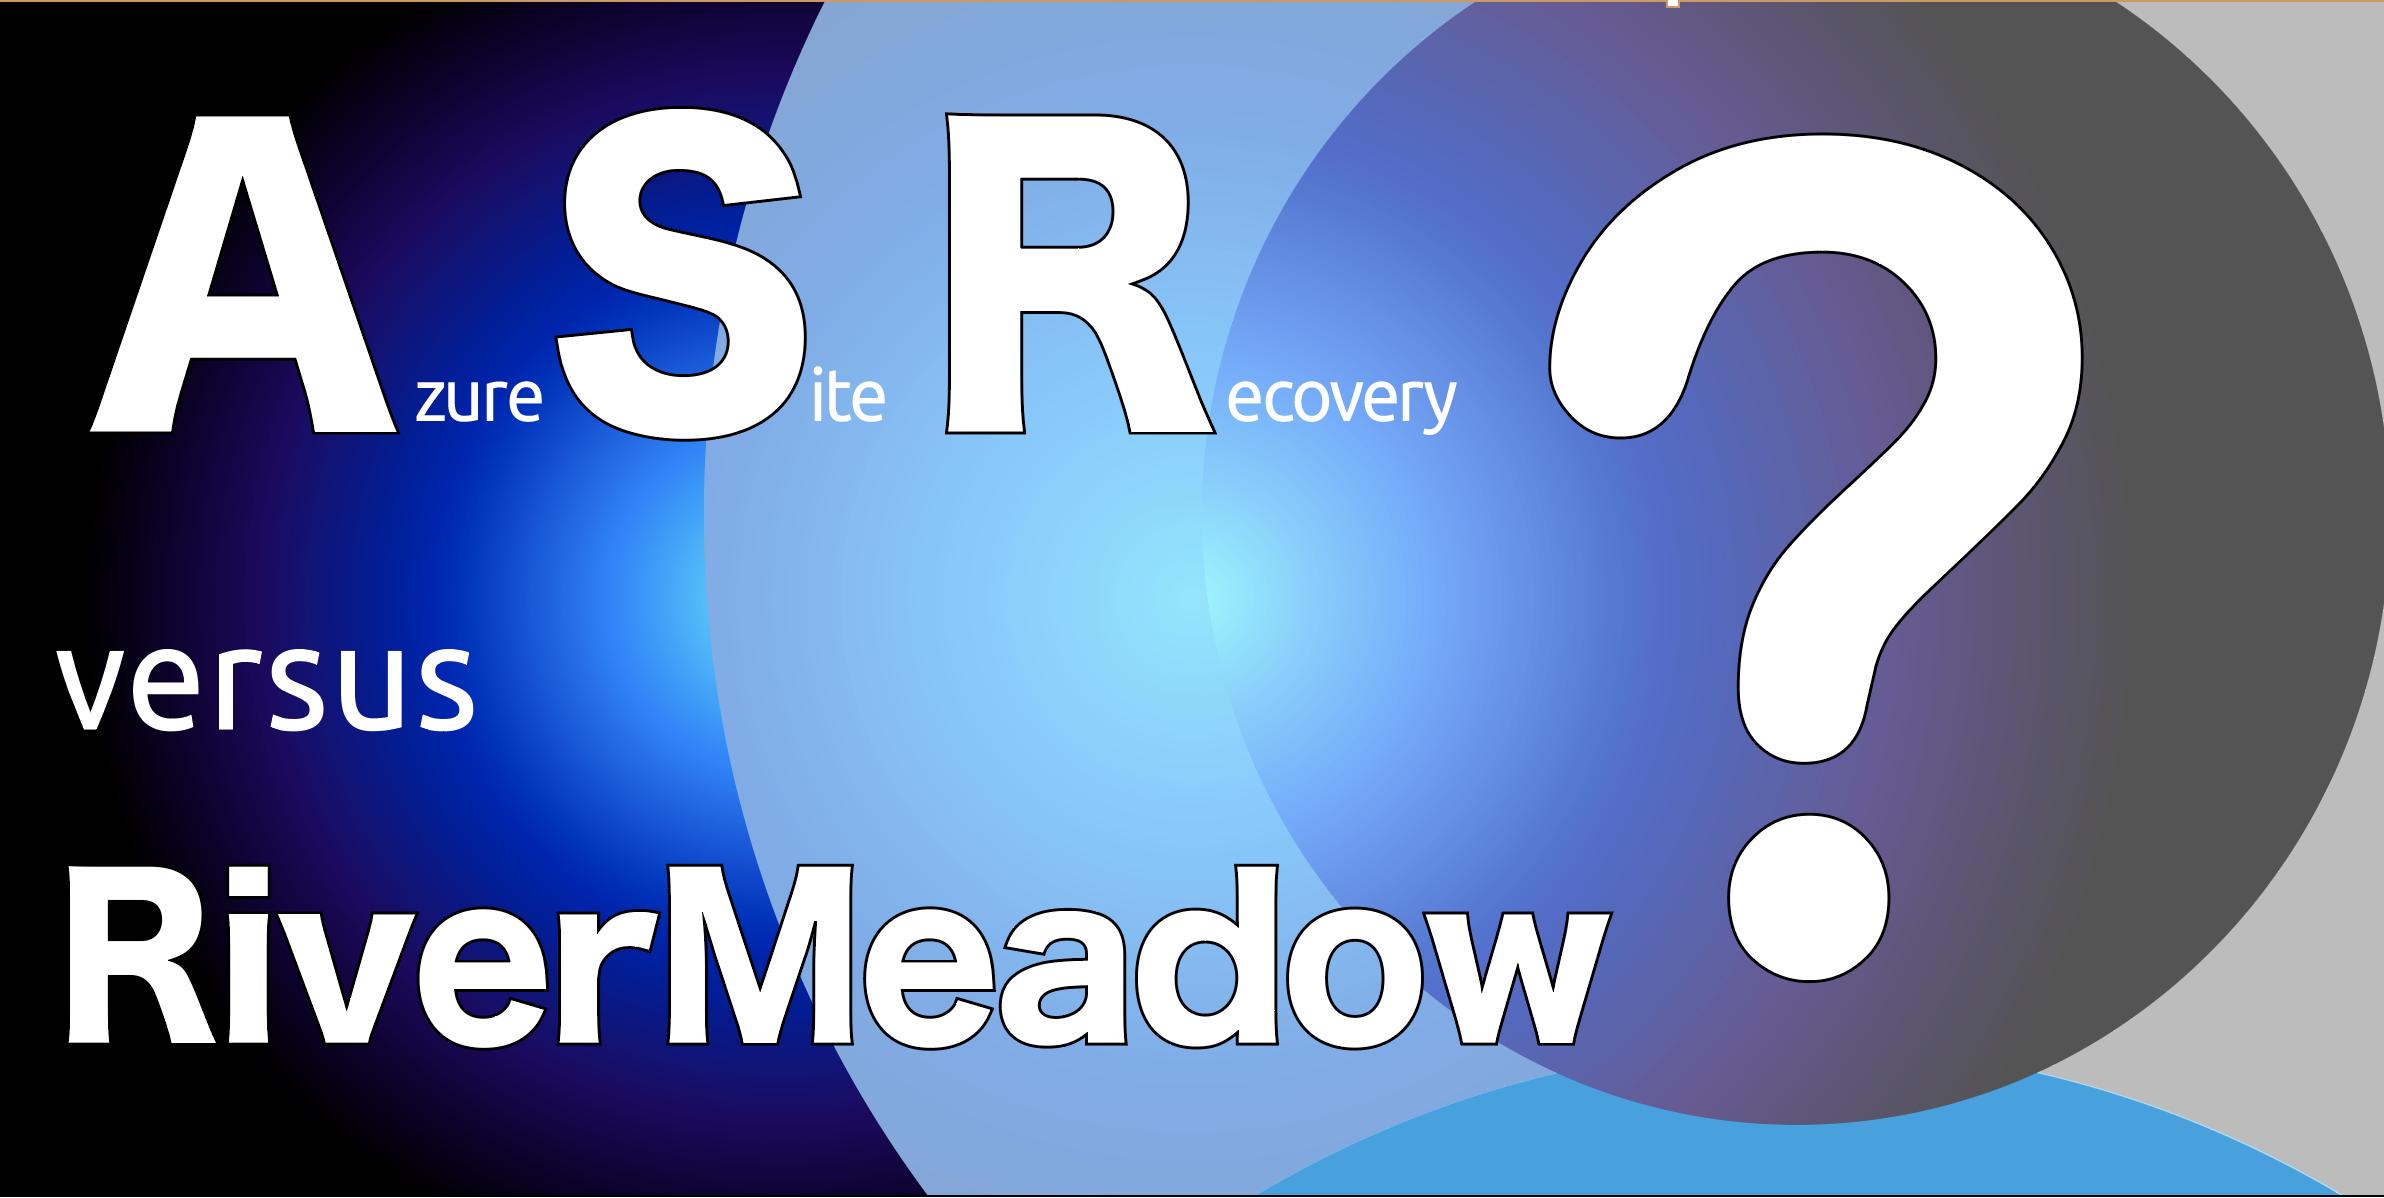 ASR versus RiverMeadow